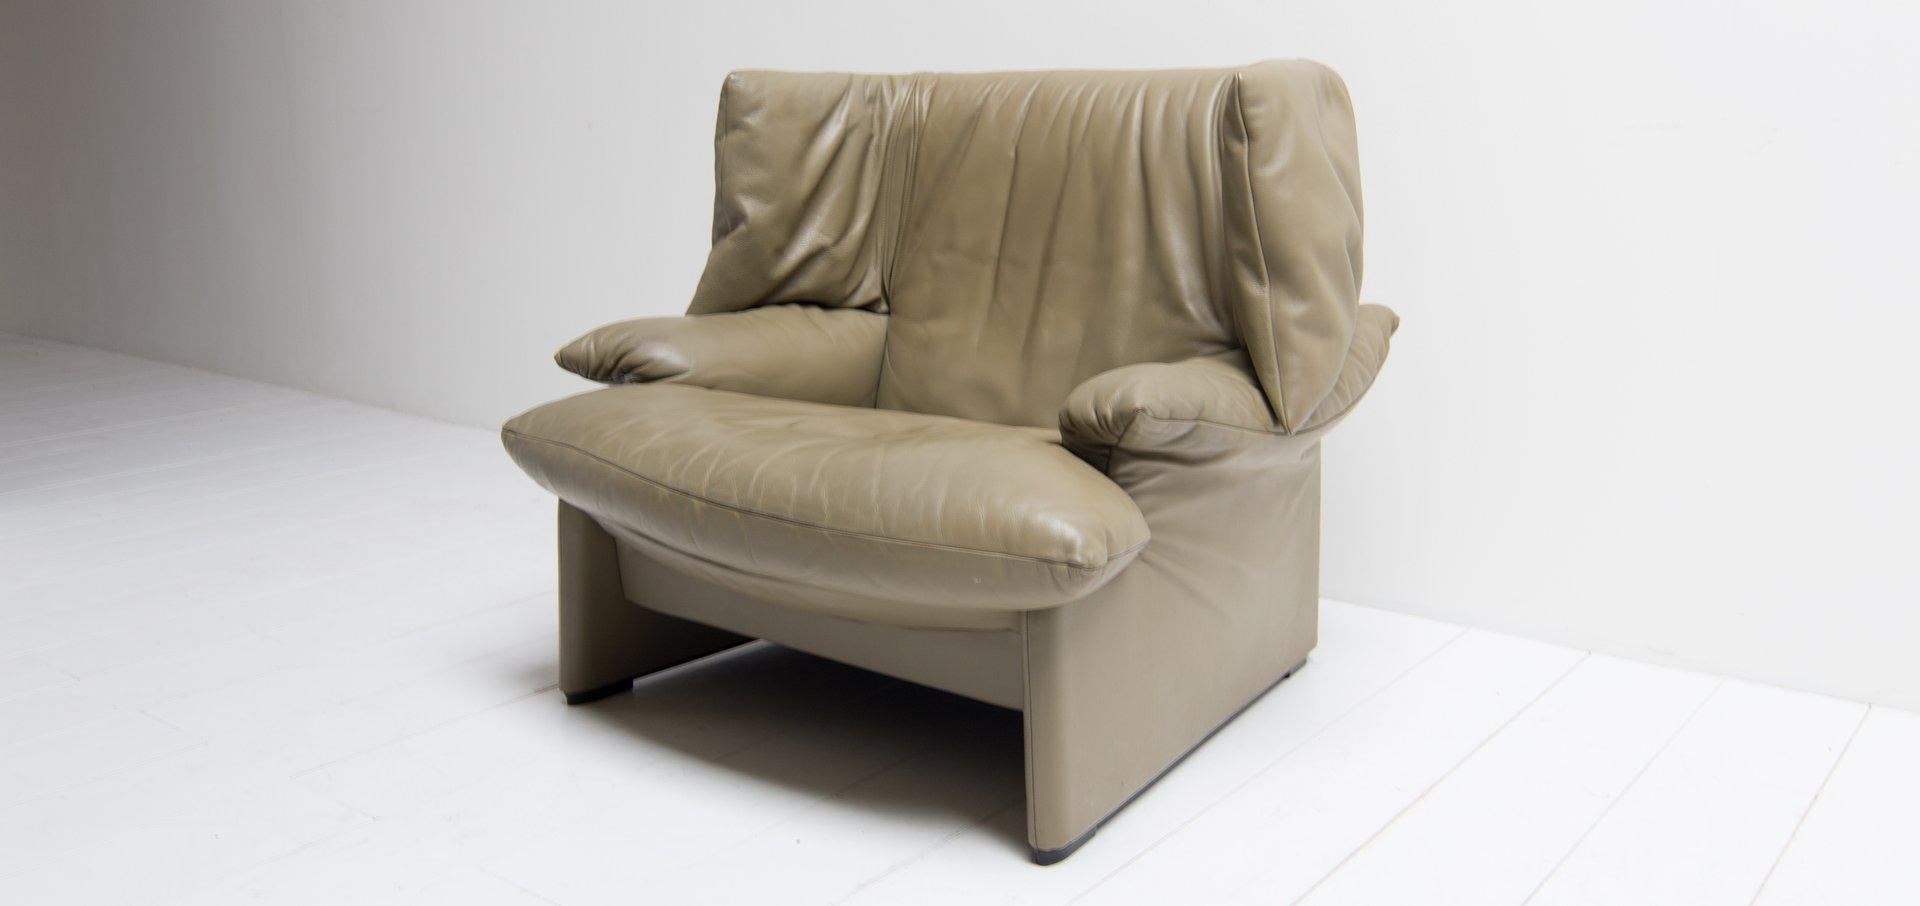 italian portovenere wingback chair by vico magistretti for cassina 1989 for sale at pamono. Black Bedroom Furniture Sets. Home Design Ideas